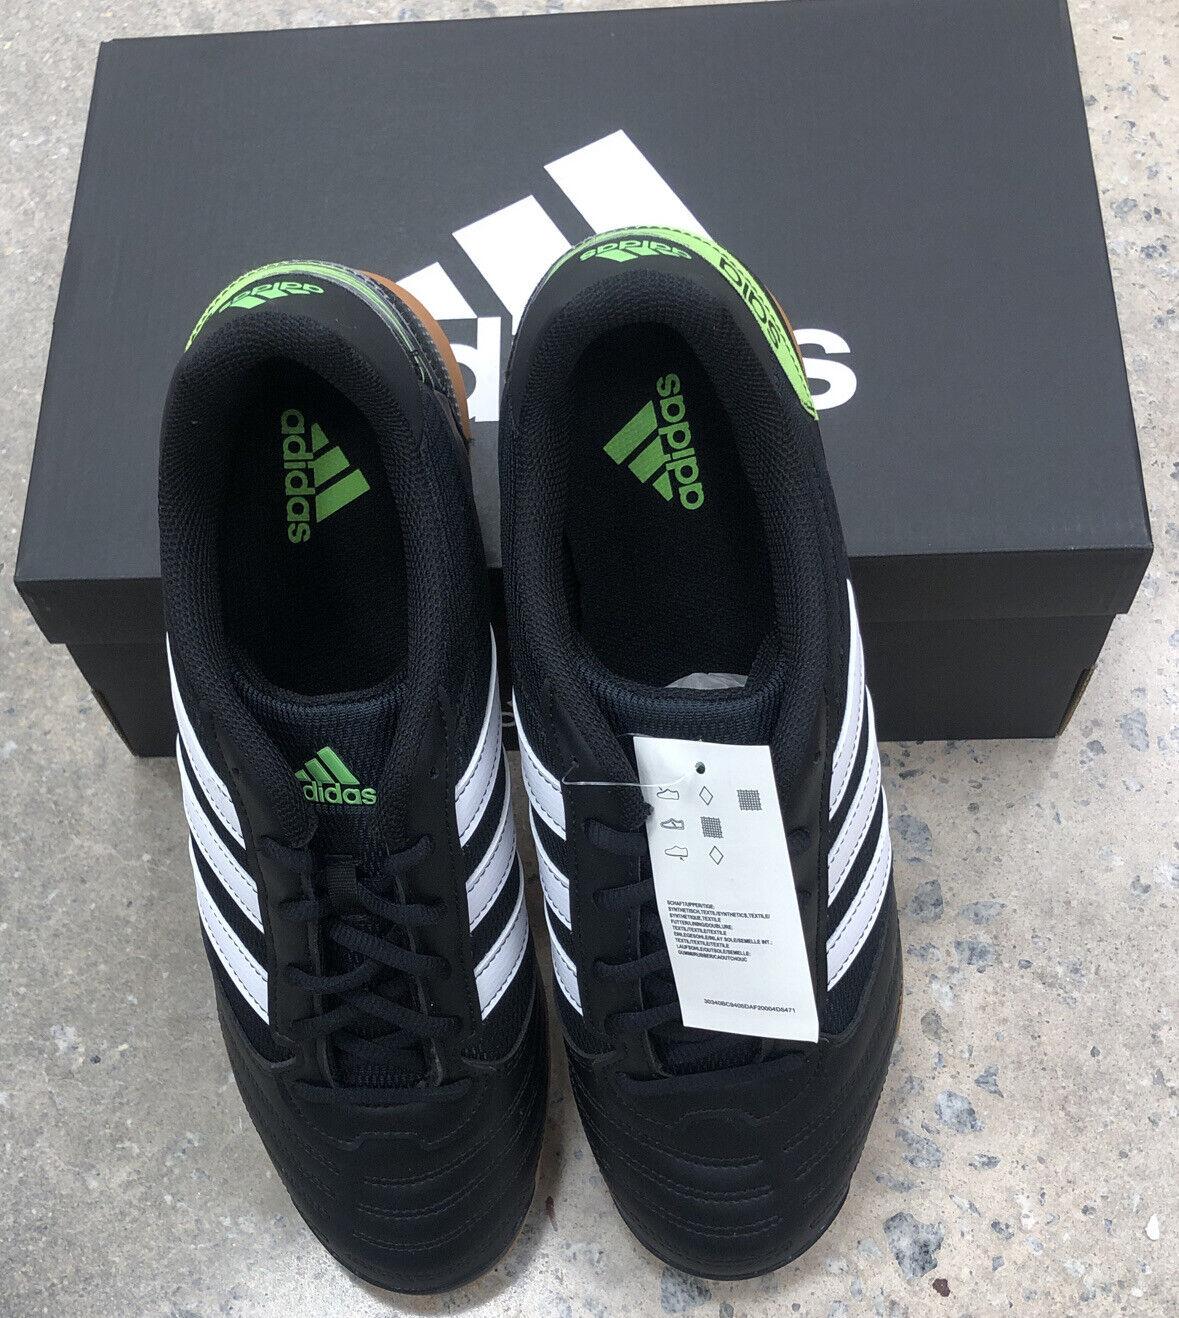 adidas Super Sala Core Black White Solar Green Fv5456 3 Stripes ...